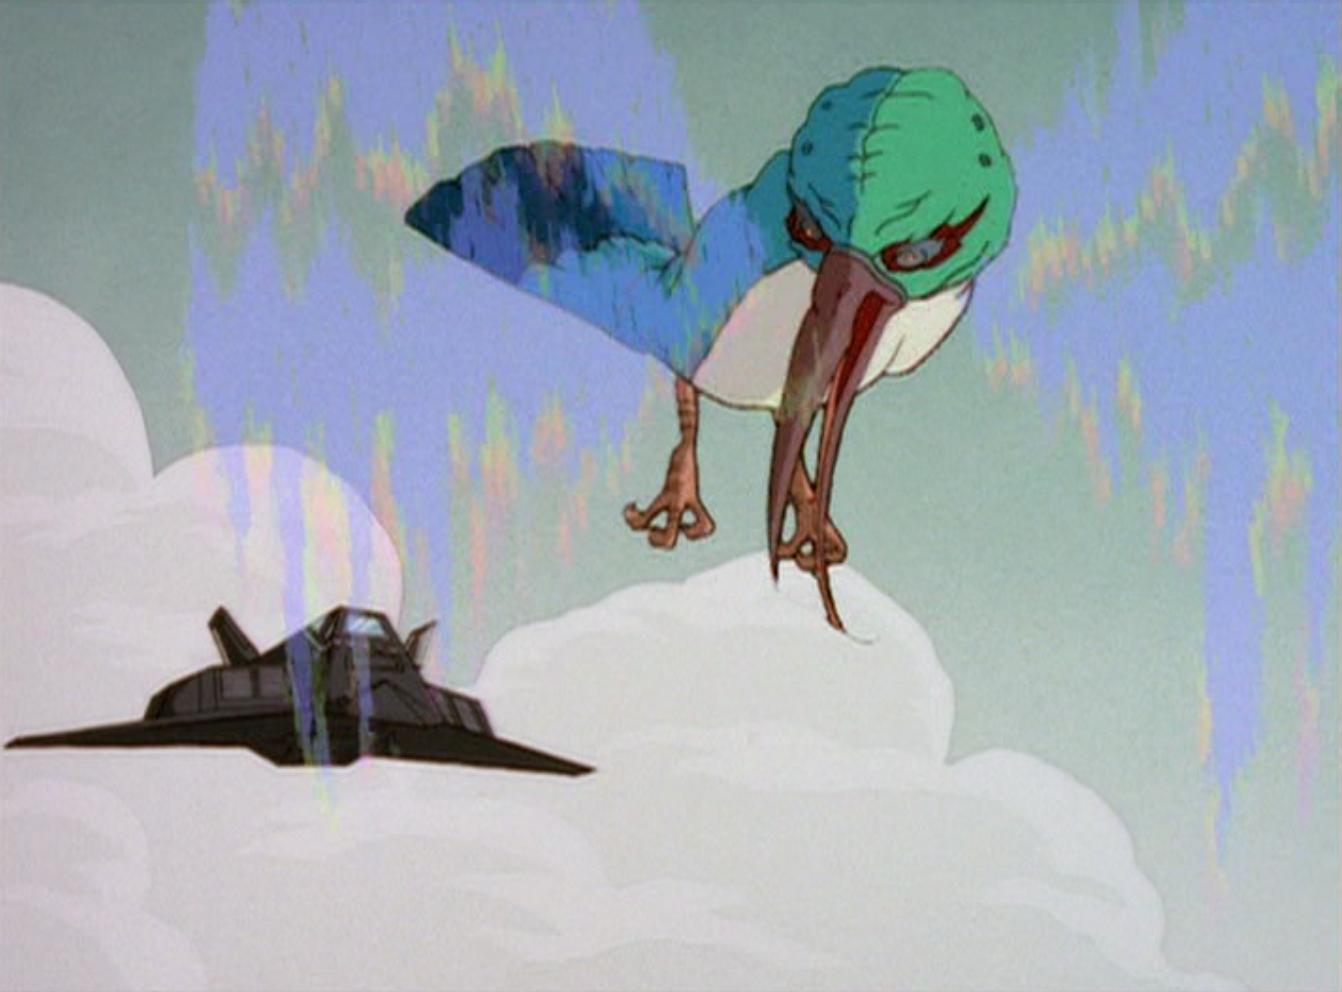 Giant Mutant Hummingbird